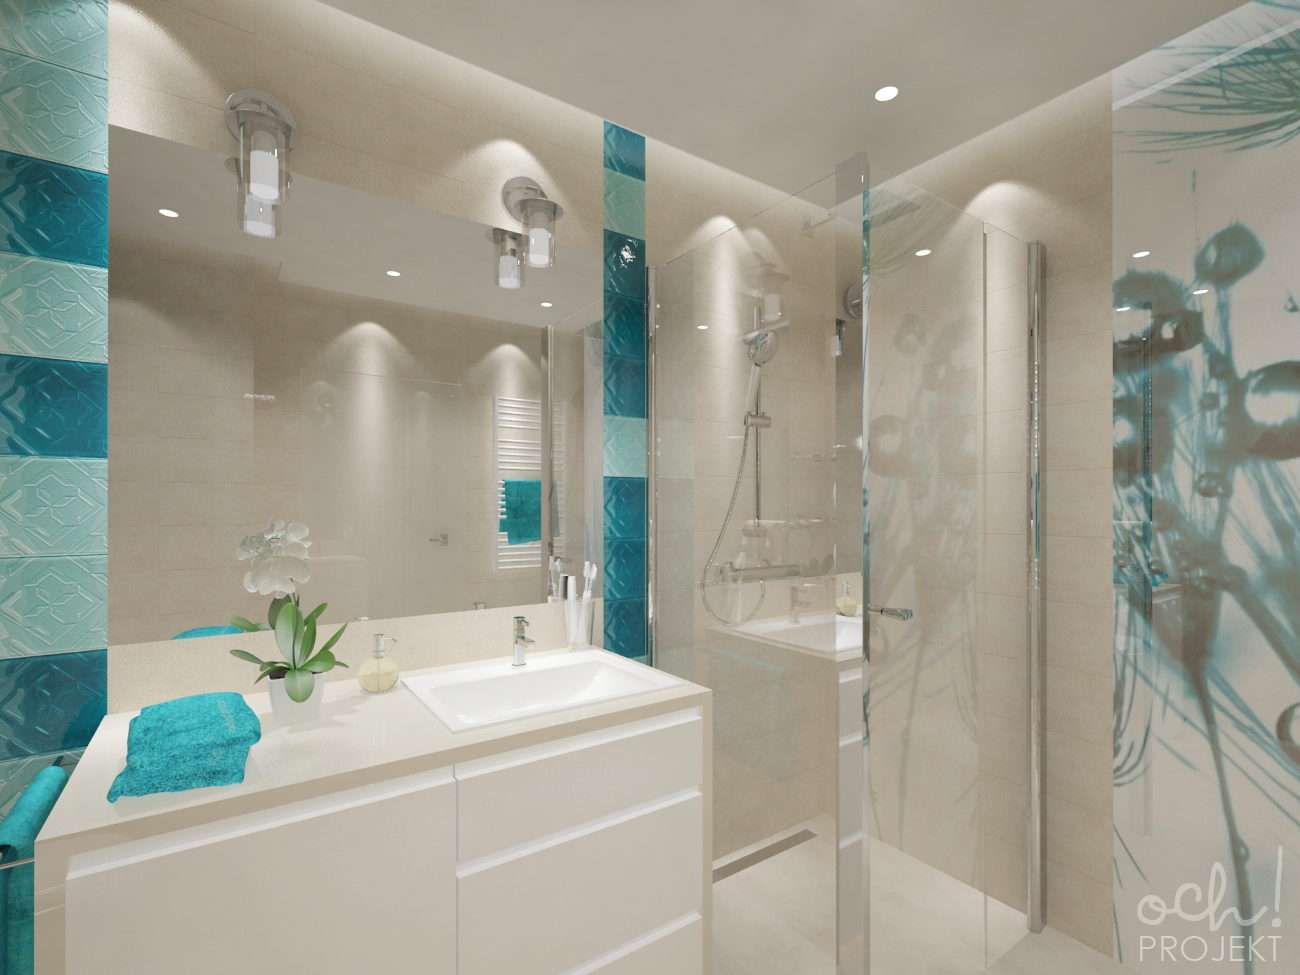 Ochprojekt Projekt Turkusowej Sypialni I łazienki